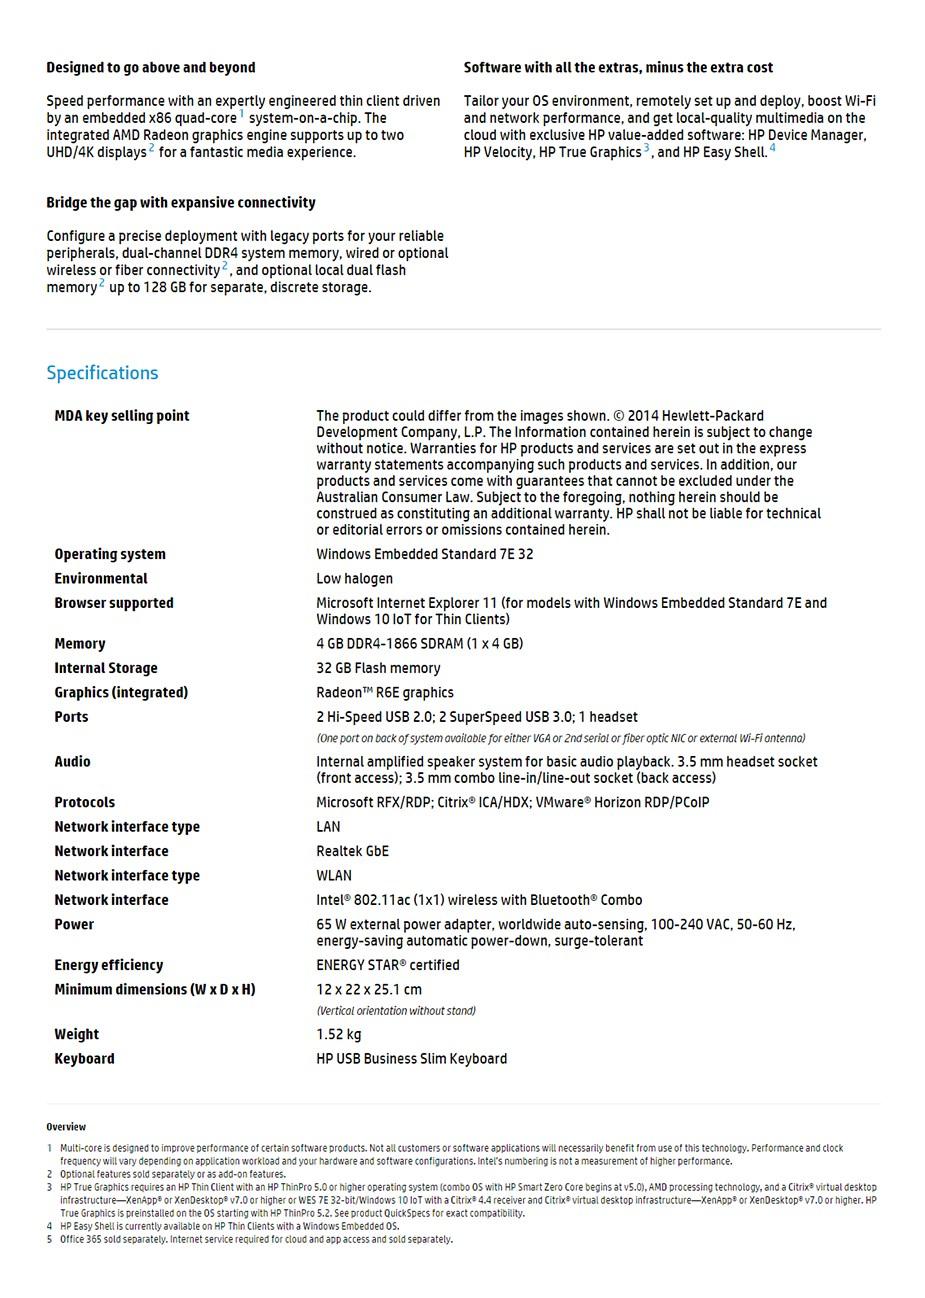 HP t630 Thin Client AMD Quad-core CPU 4GB 32GB Radeon R6E WES7E WIFI + BT - Desktop Overview 2